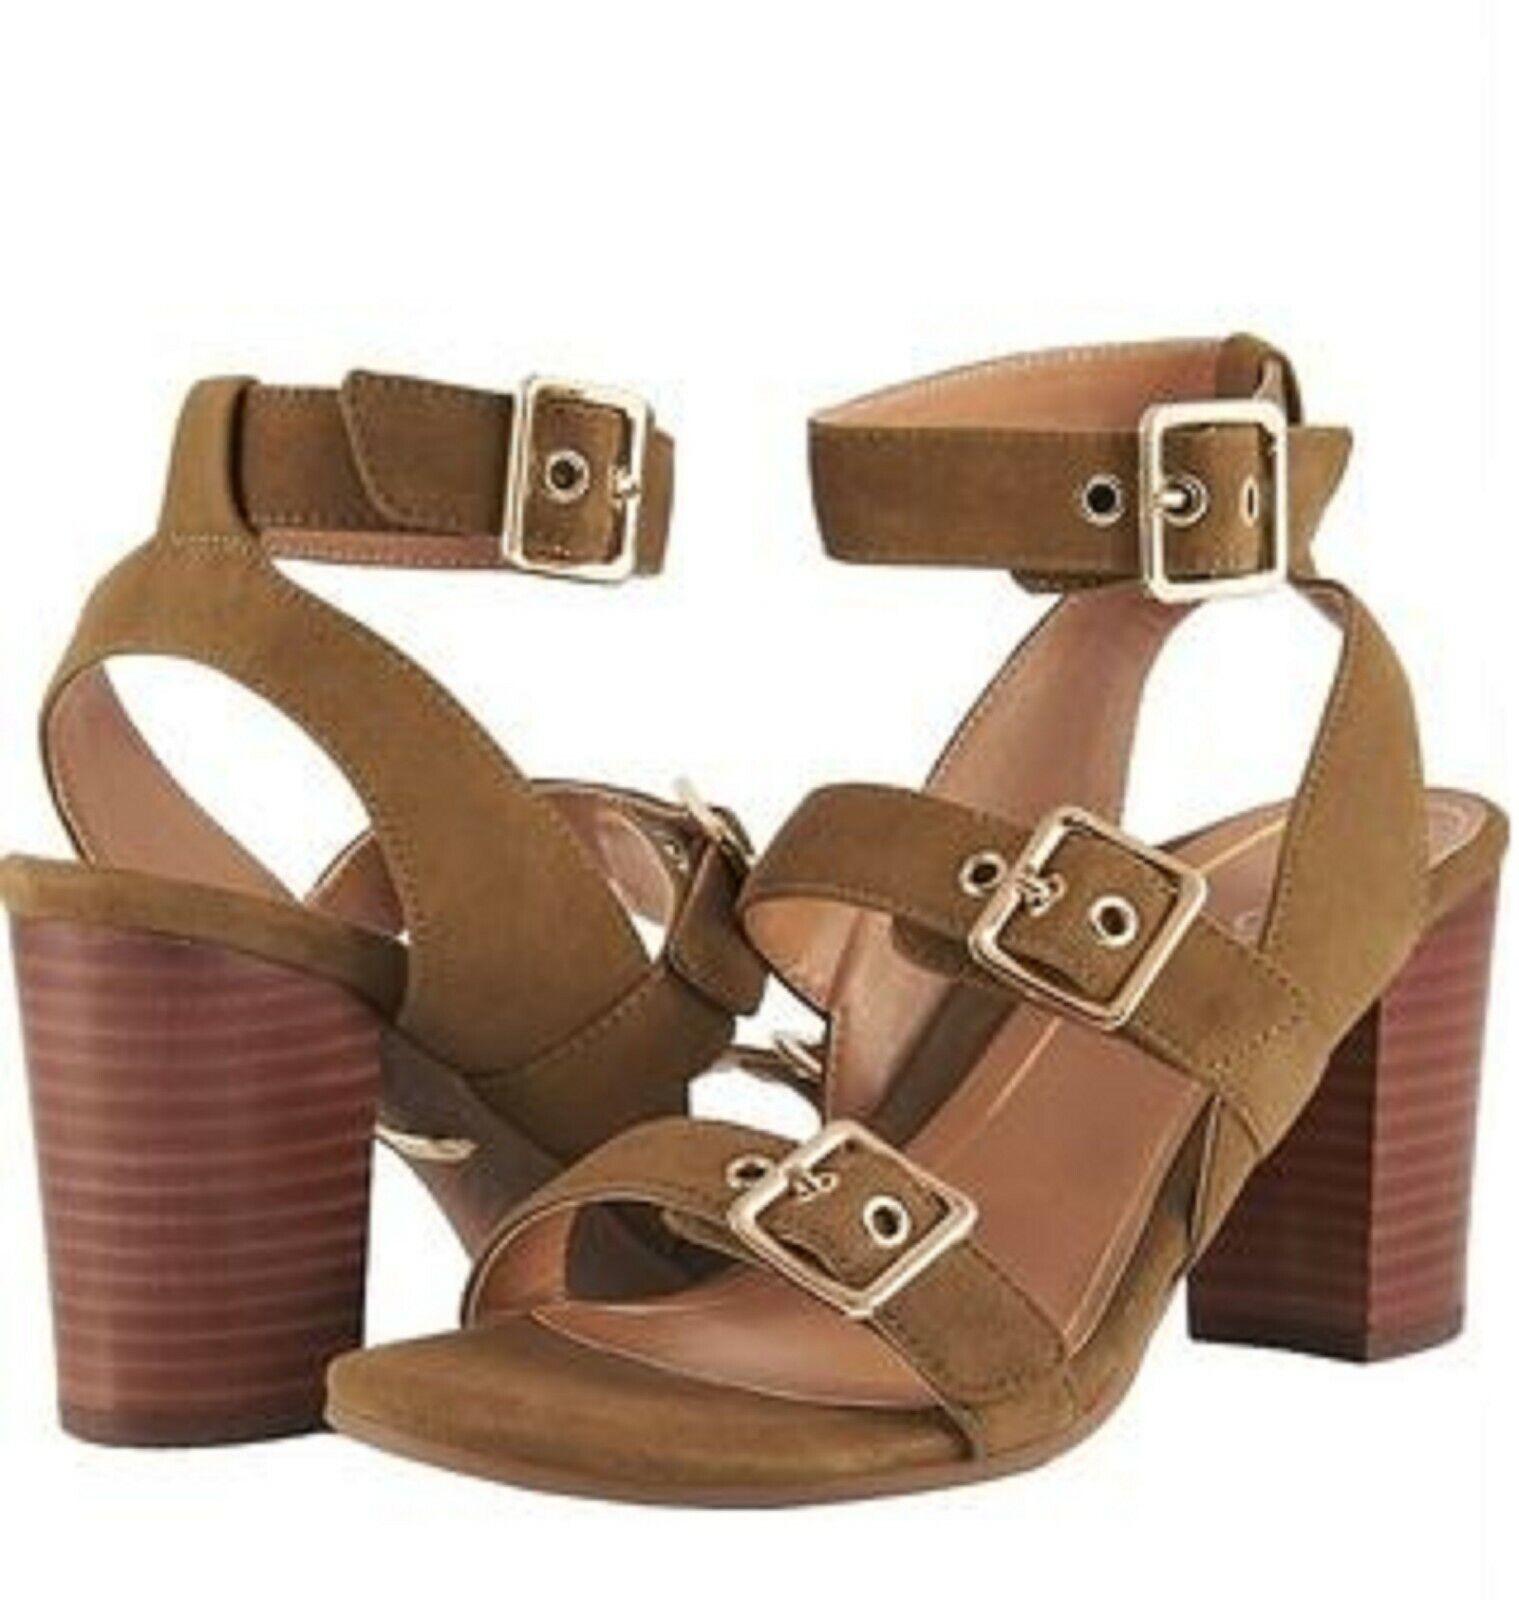 Vionic Orthaheel PERK CARMEL Block-Heel Leather Sandals Sandals Sandals OLIVE Size 9.5 M NIB 4a6c81